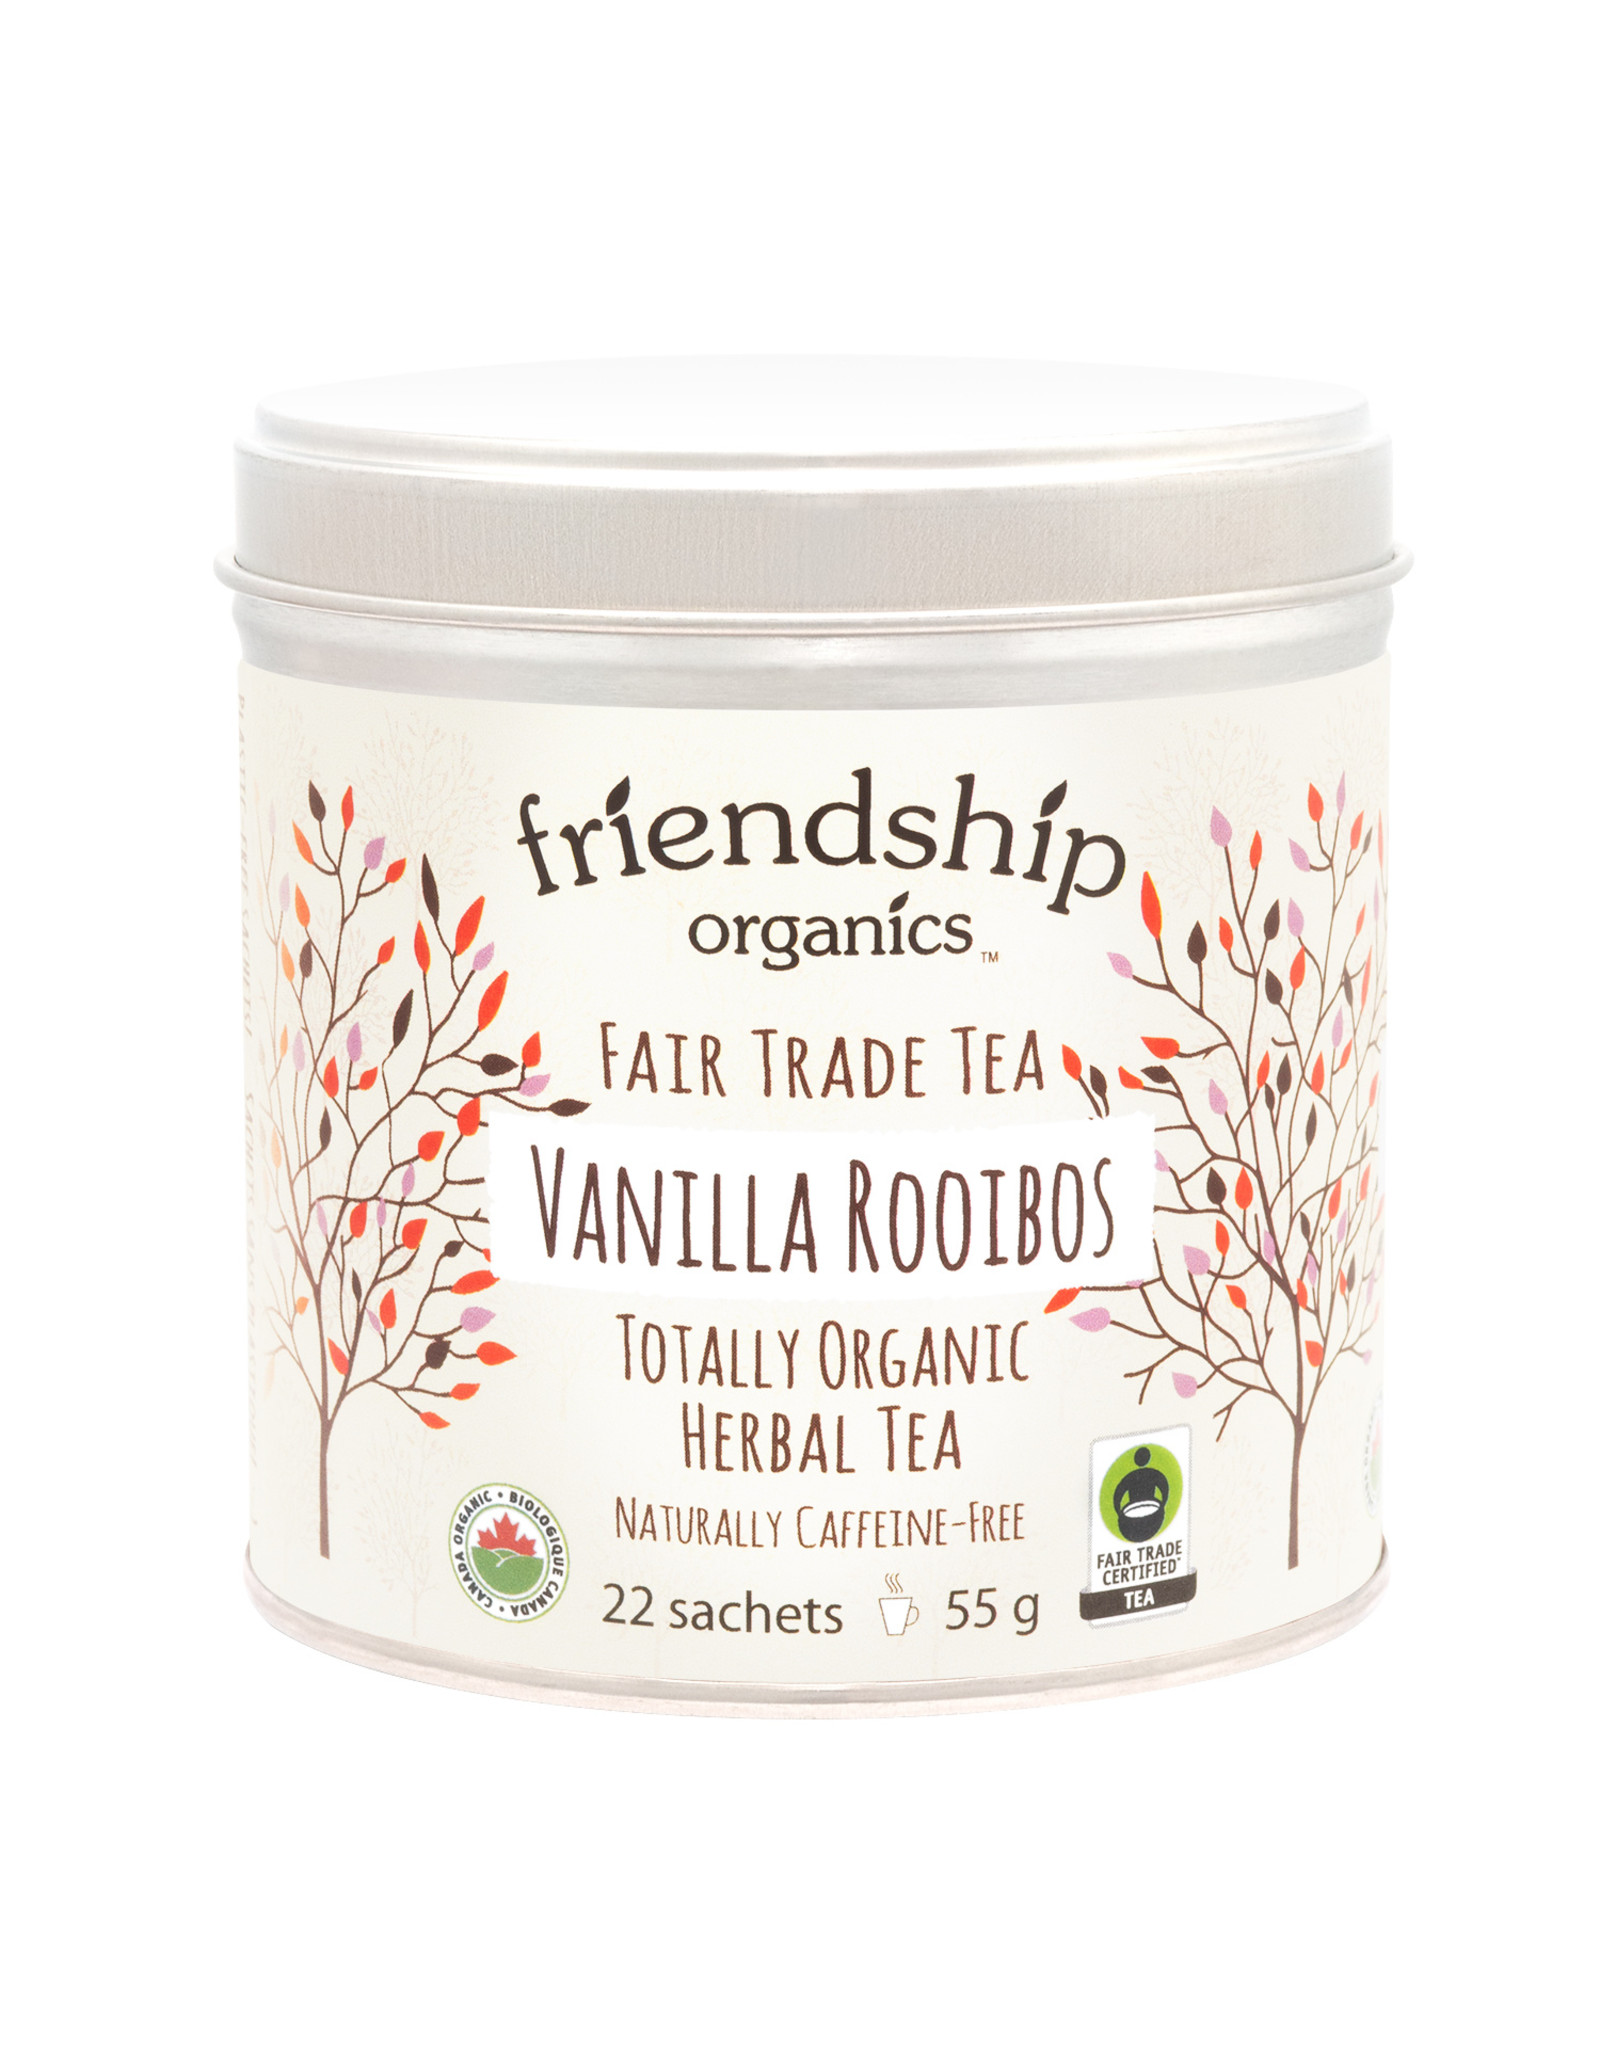 Friendship Organics Friendship Organics Vanilla Rooibos Herbal Tea Tin